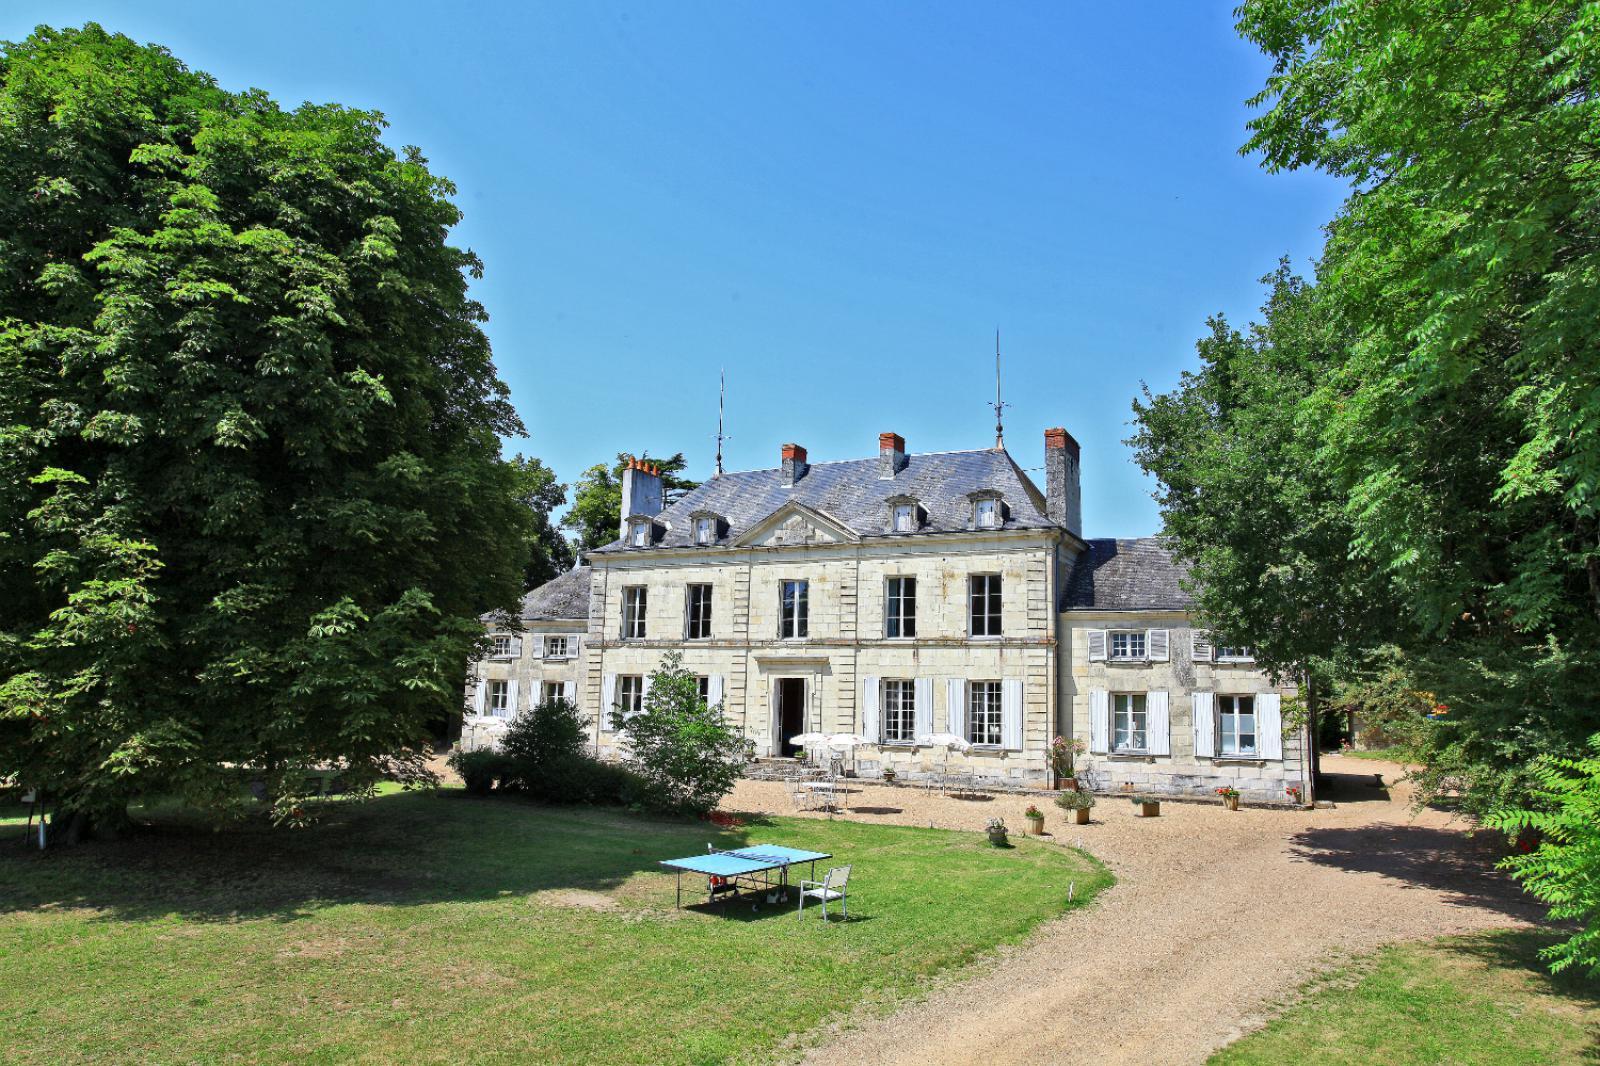 Castel Camping Le Petit Trianon